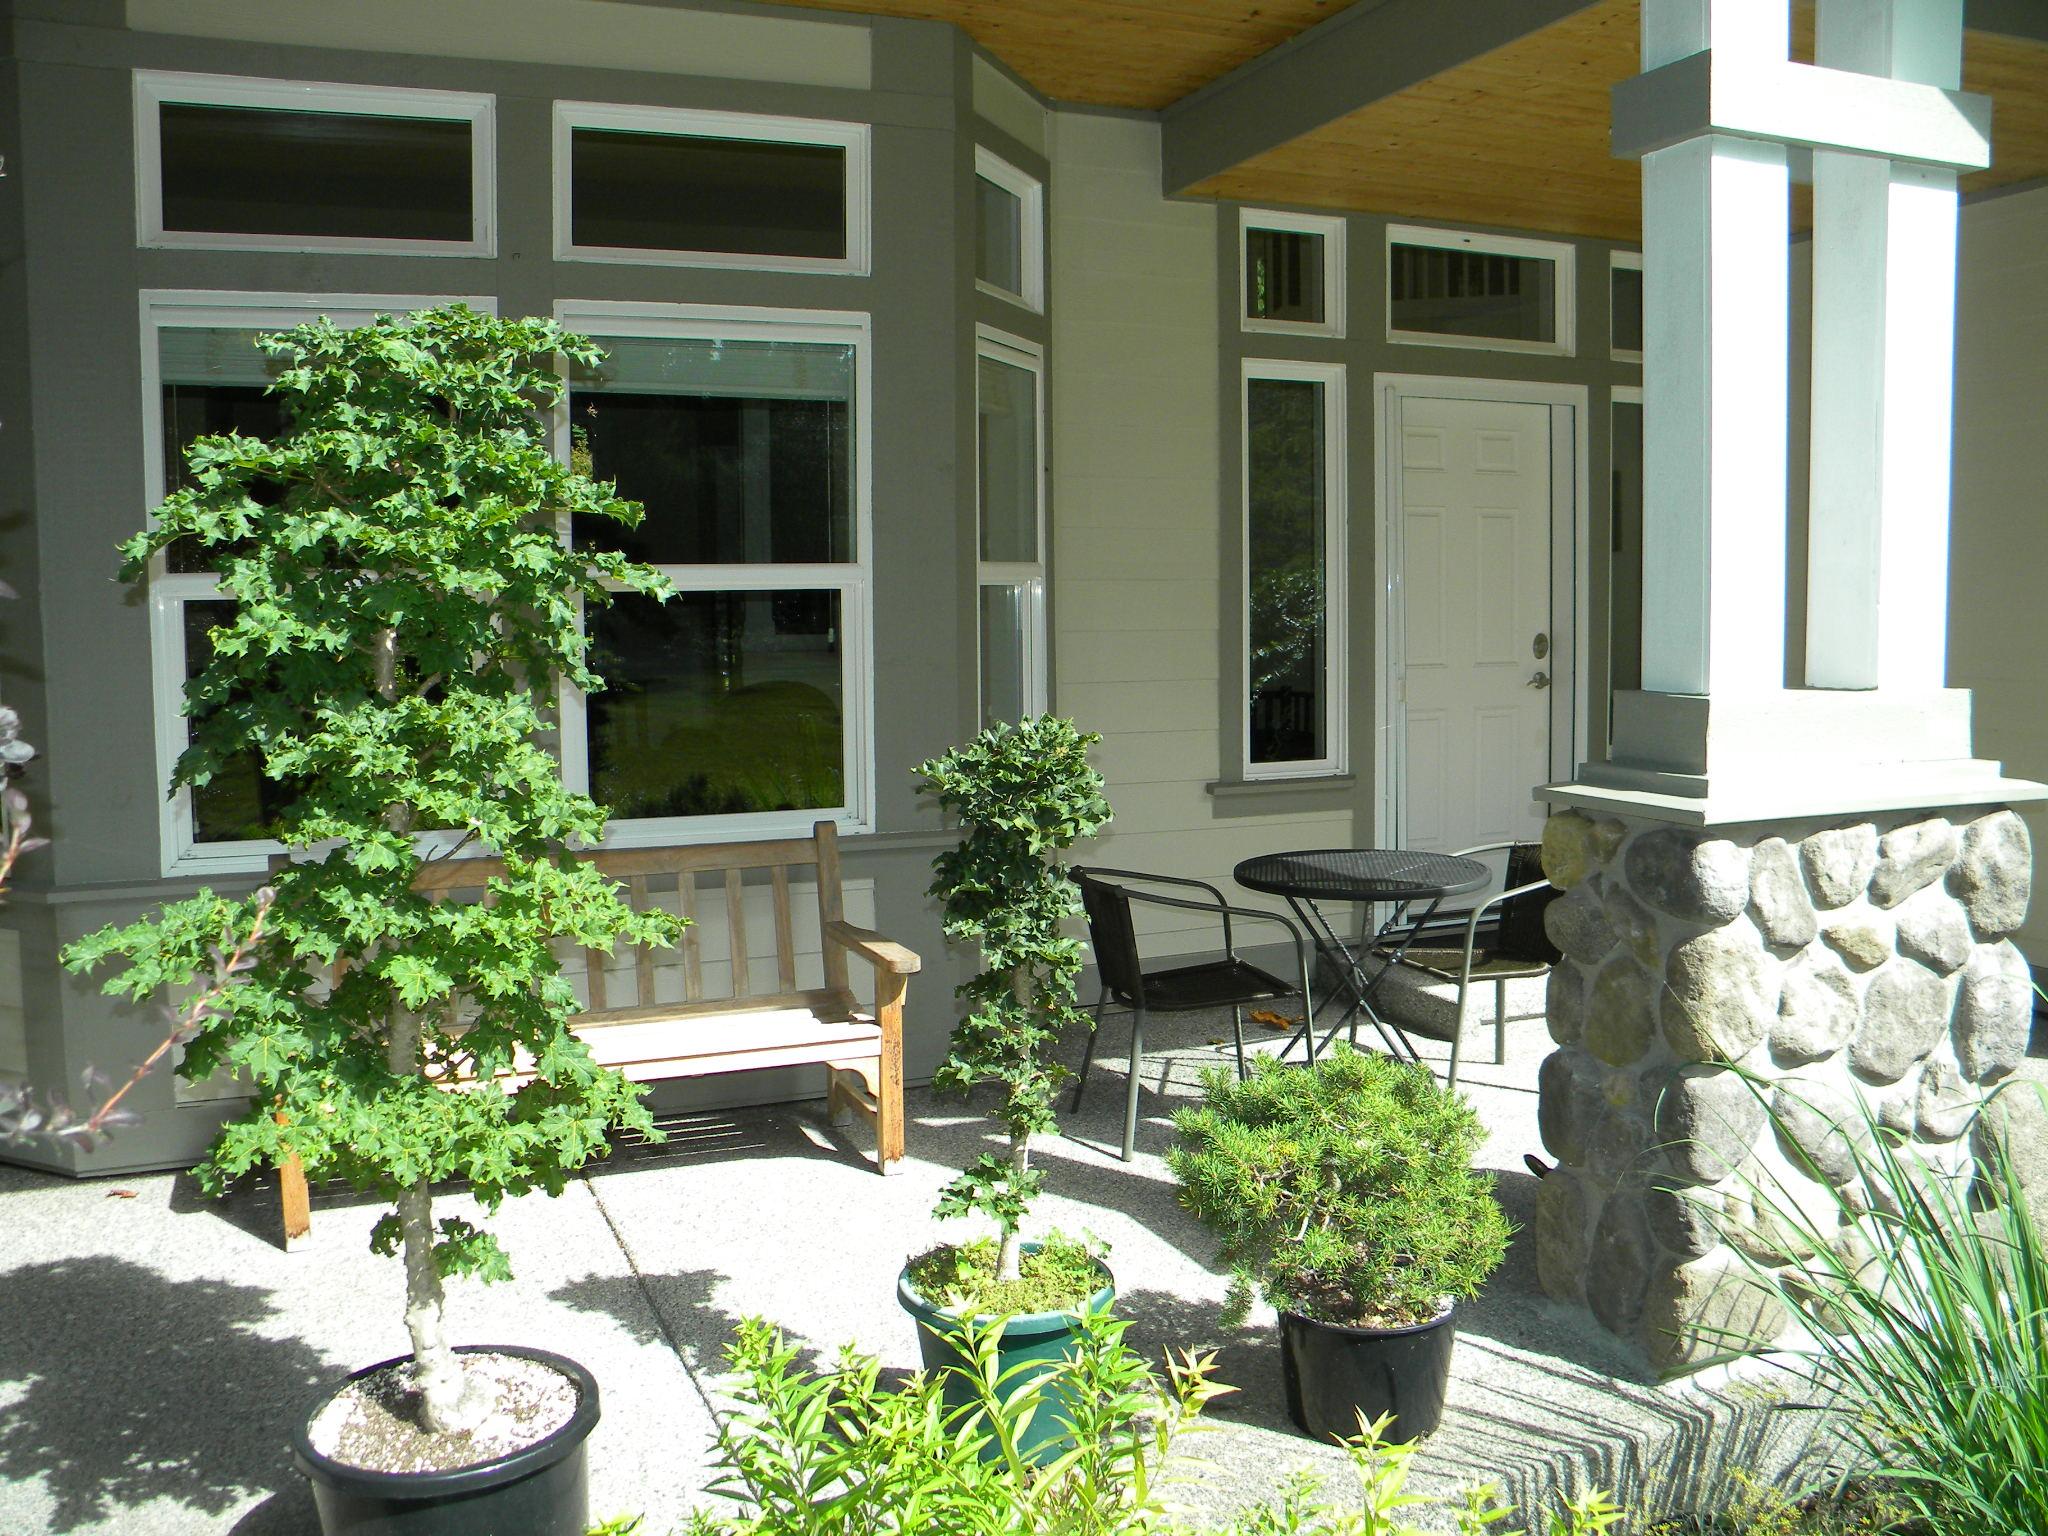 snohomish_craftsman_Front Porch-covered2129.JPG